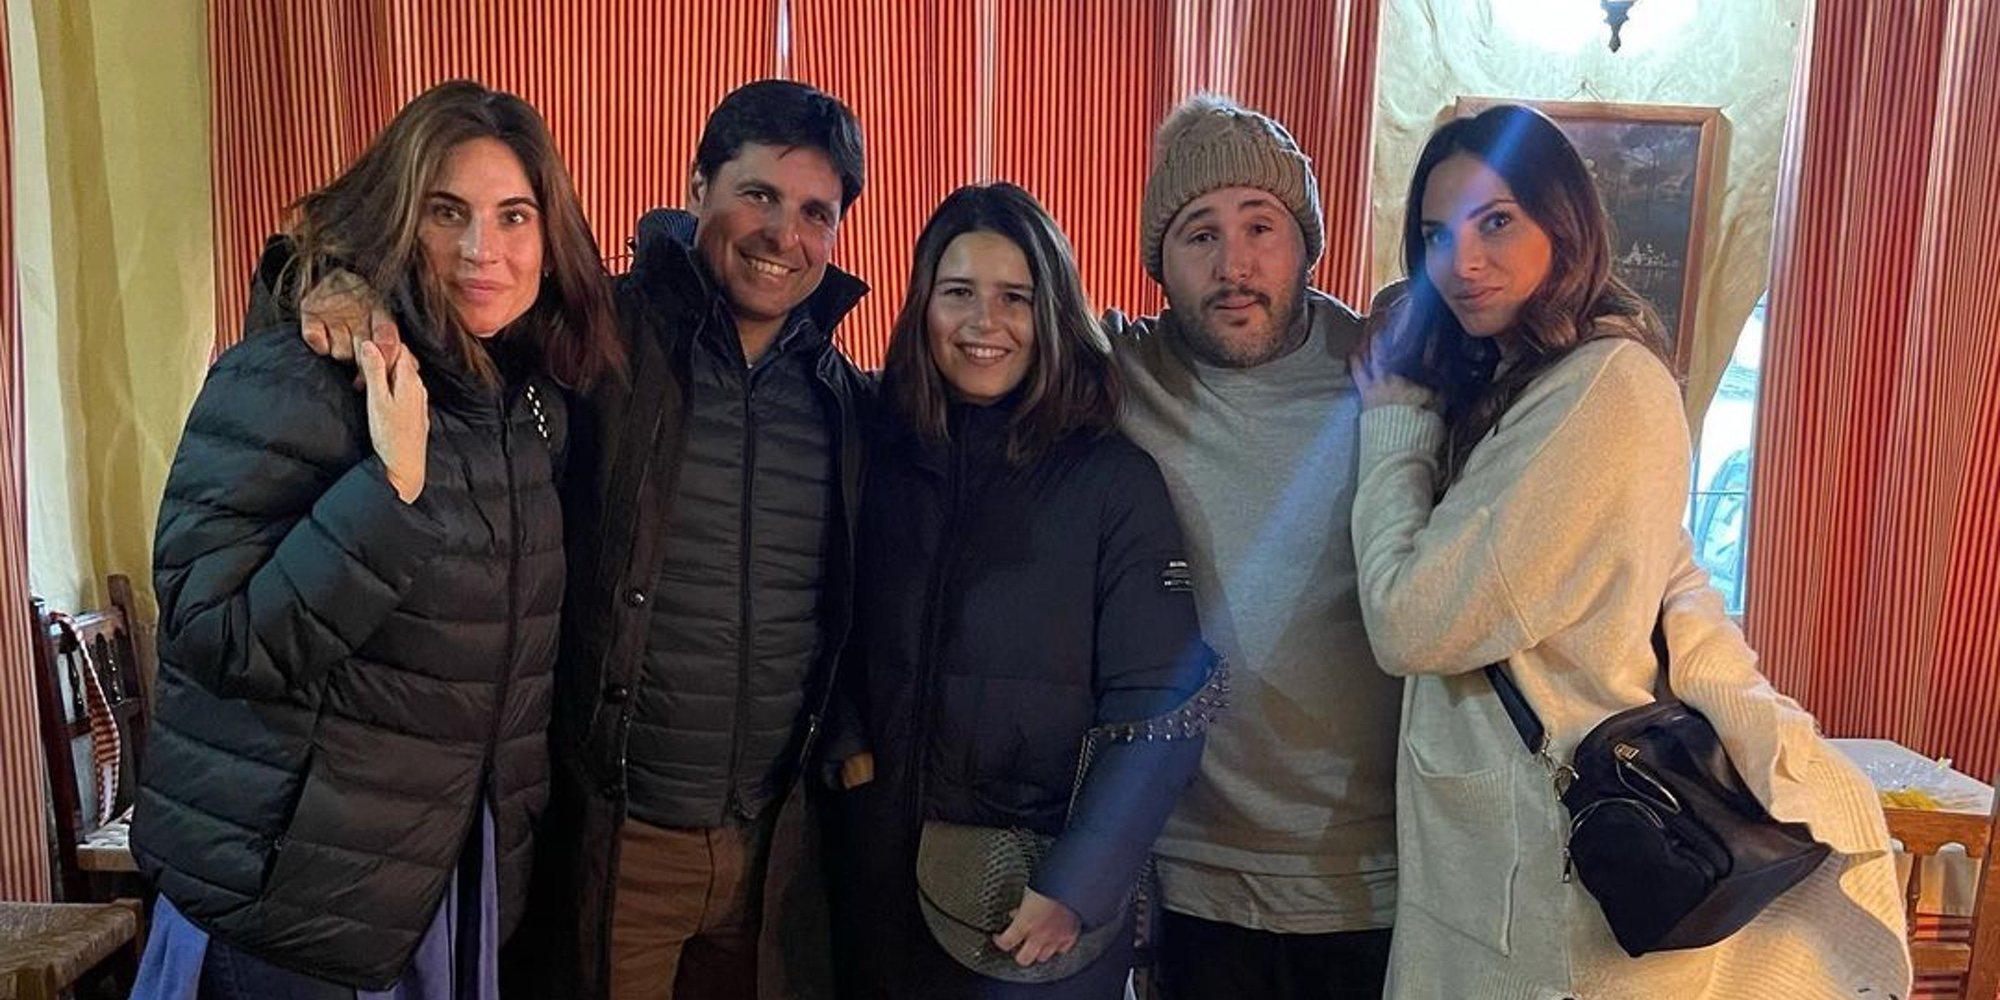 El plan de domingo de Kiko Rivera e Irene Rosales con Fran Rivera, Lourdes Montes y Tana Rivera